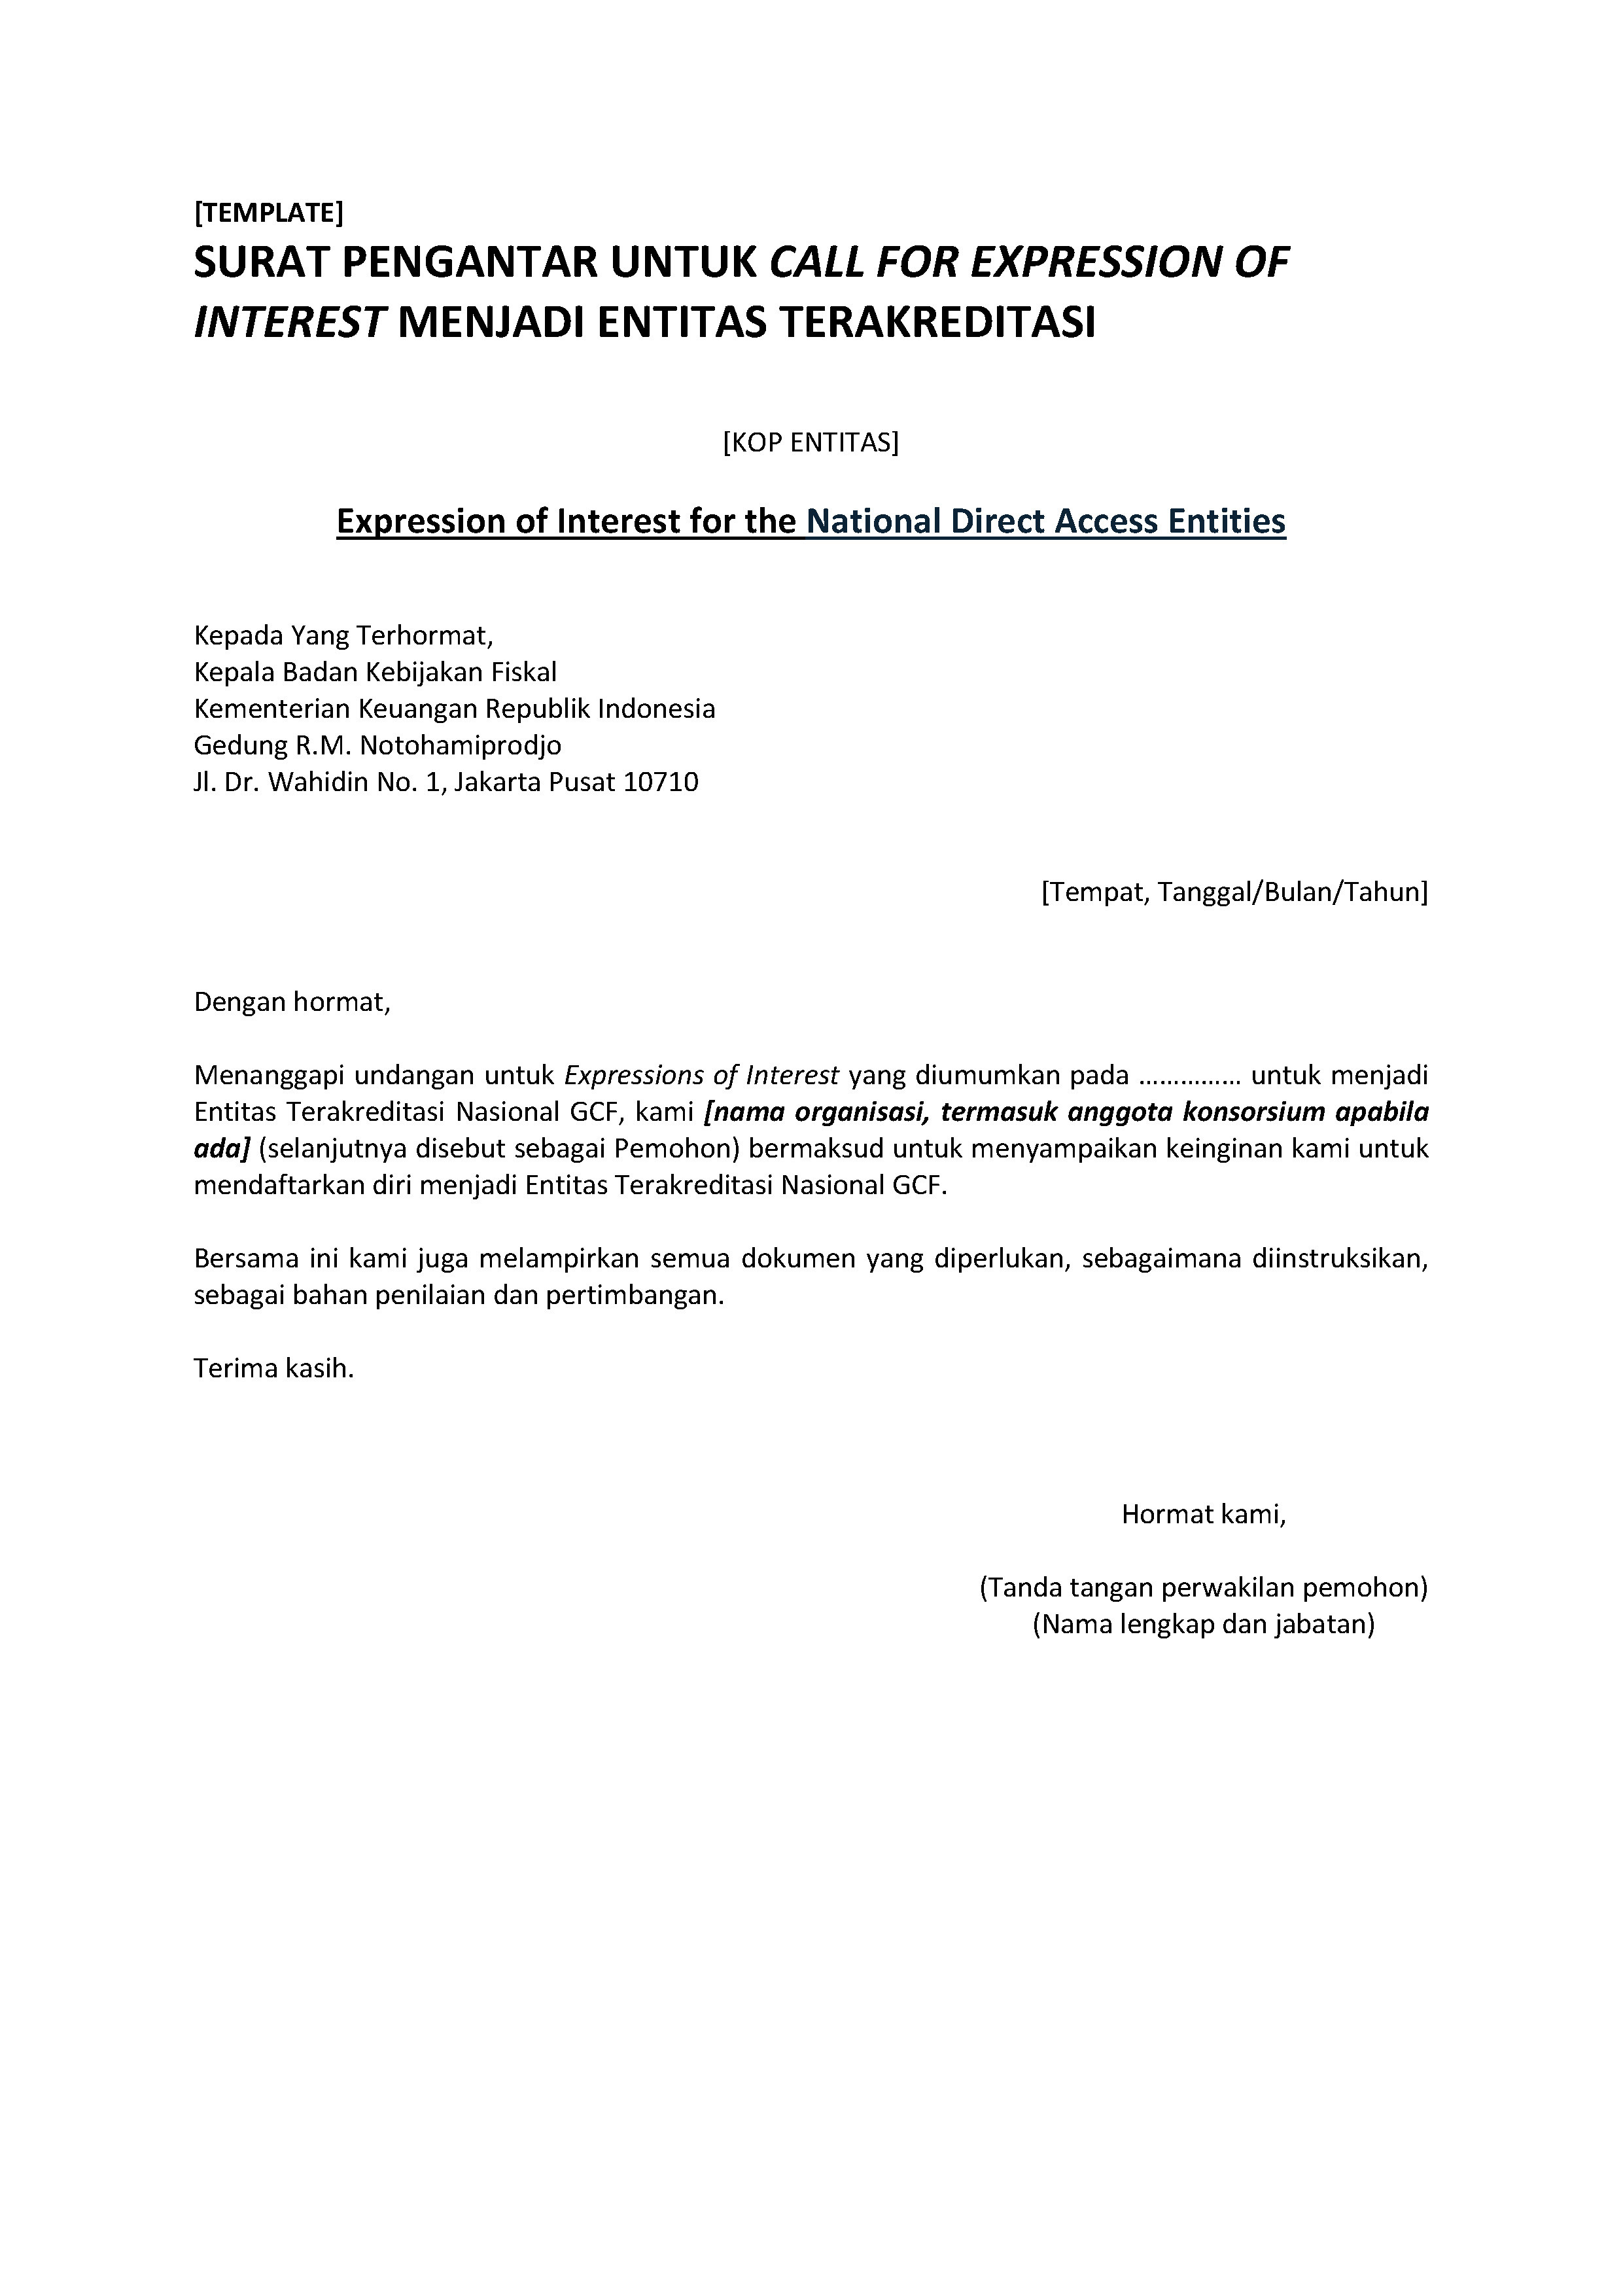 Letter Of Interest Template from fiskal.kemenkeu.go.id